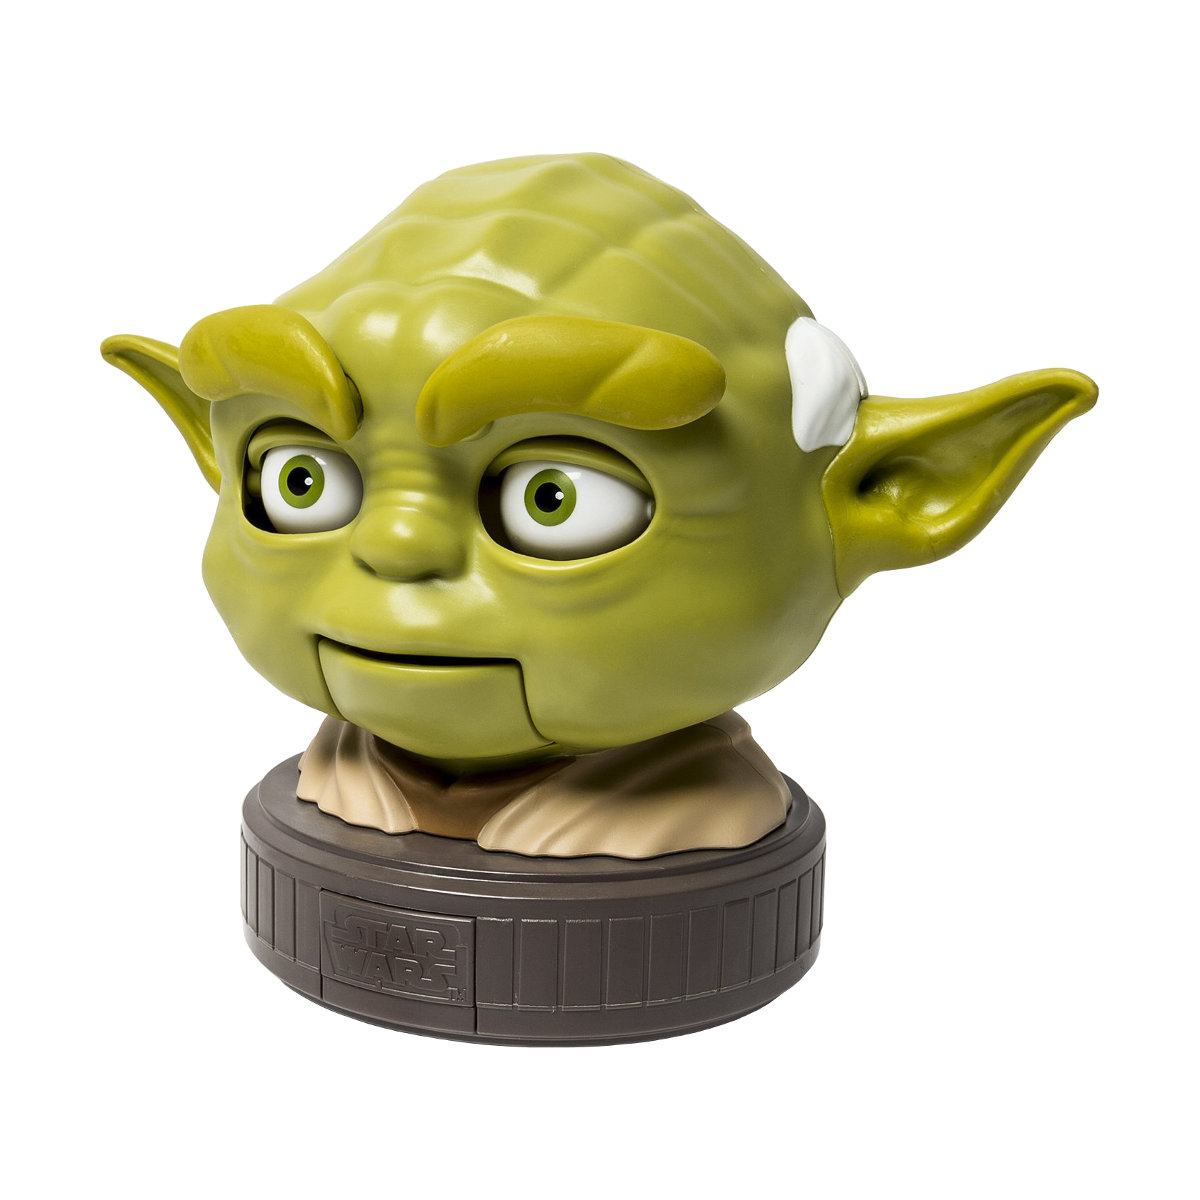 Spin Master Star Wars, Бормочущие головы, green